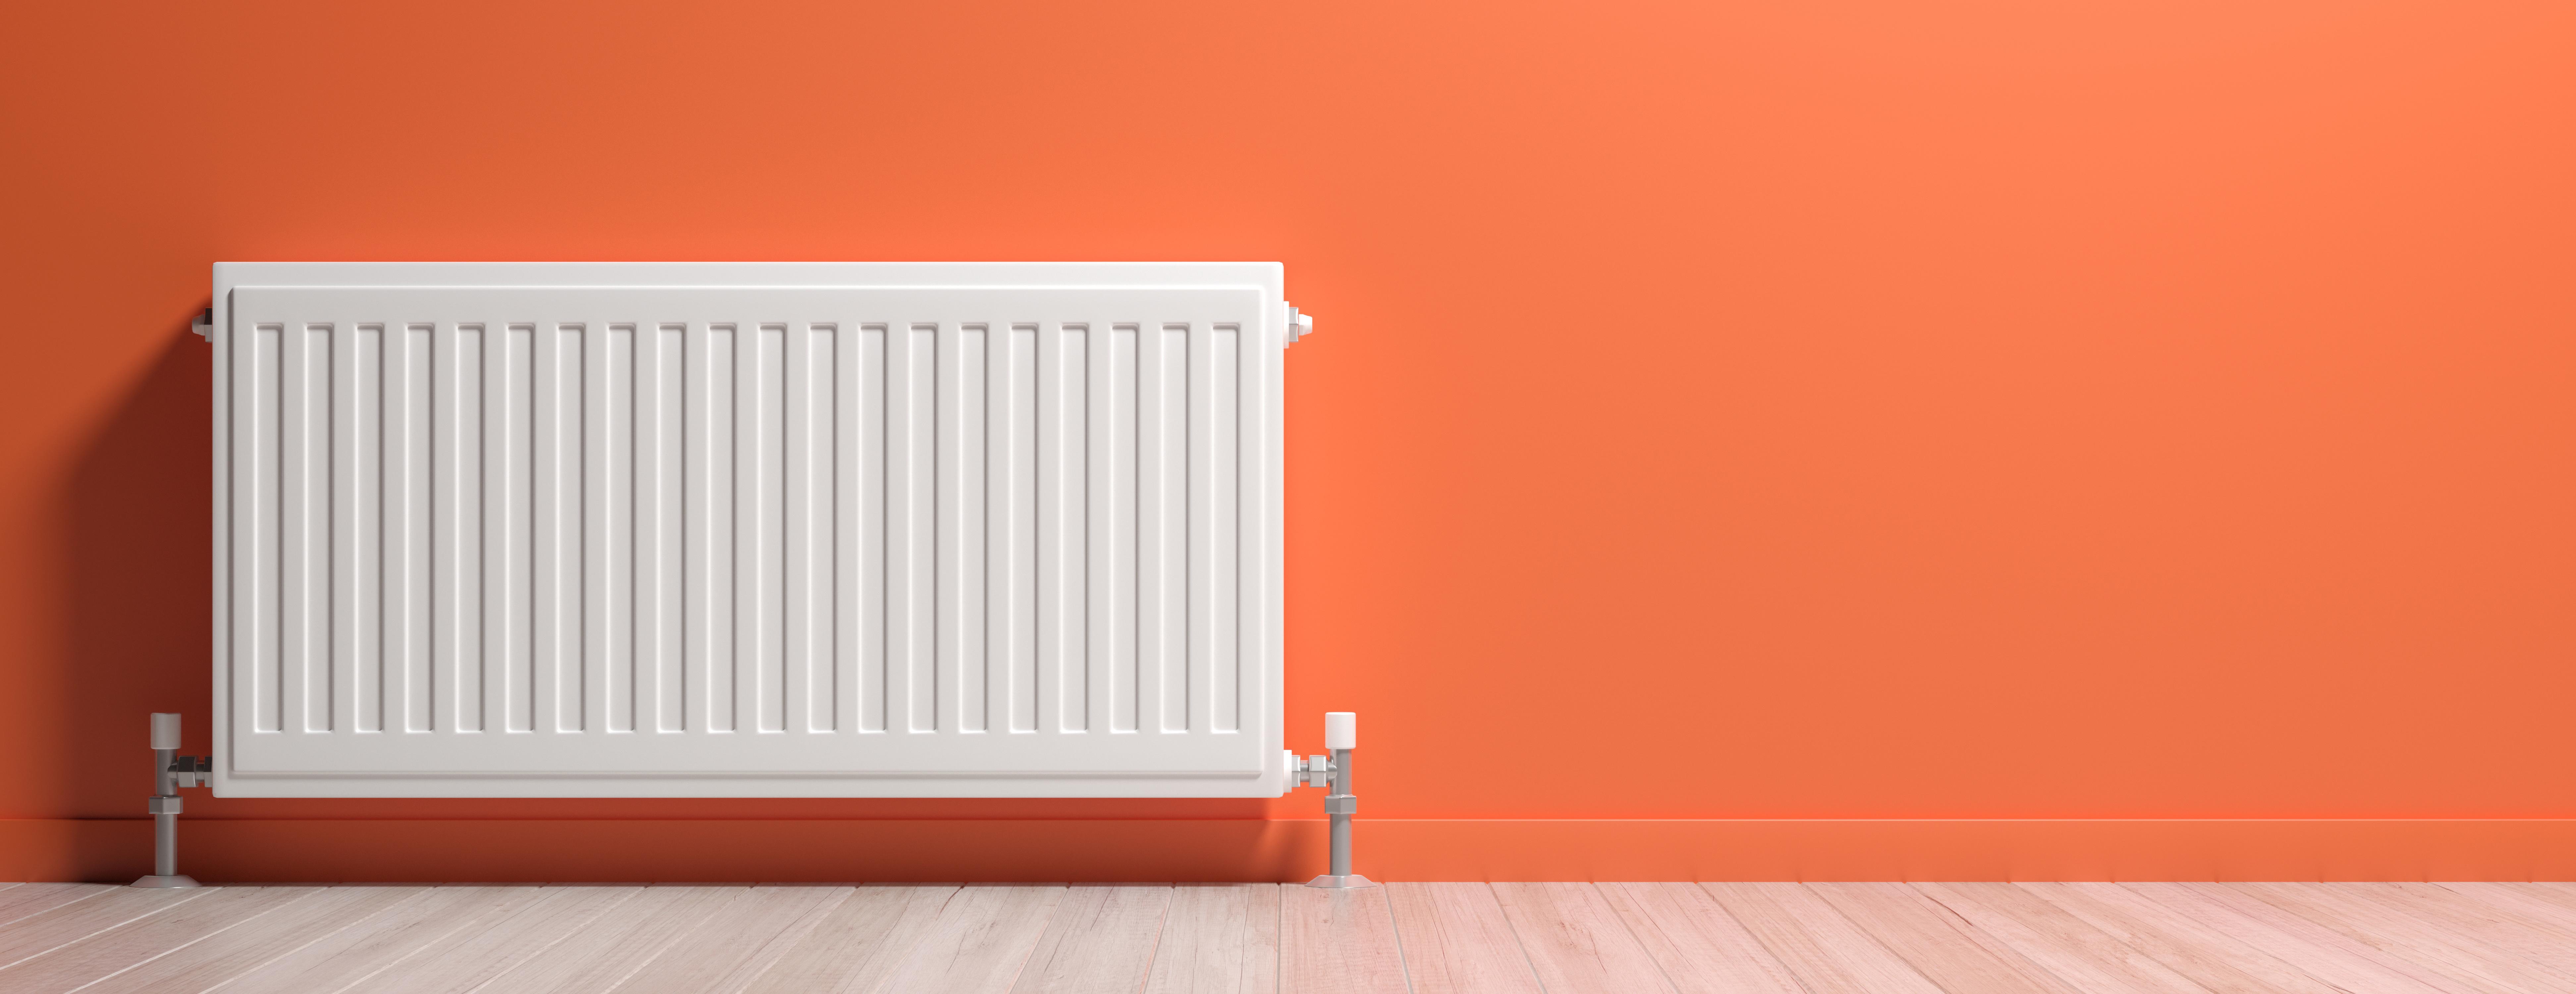 heating radiator room universal carbon tax energy consumption environment